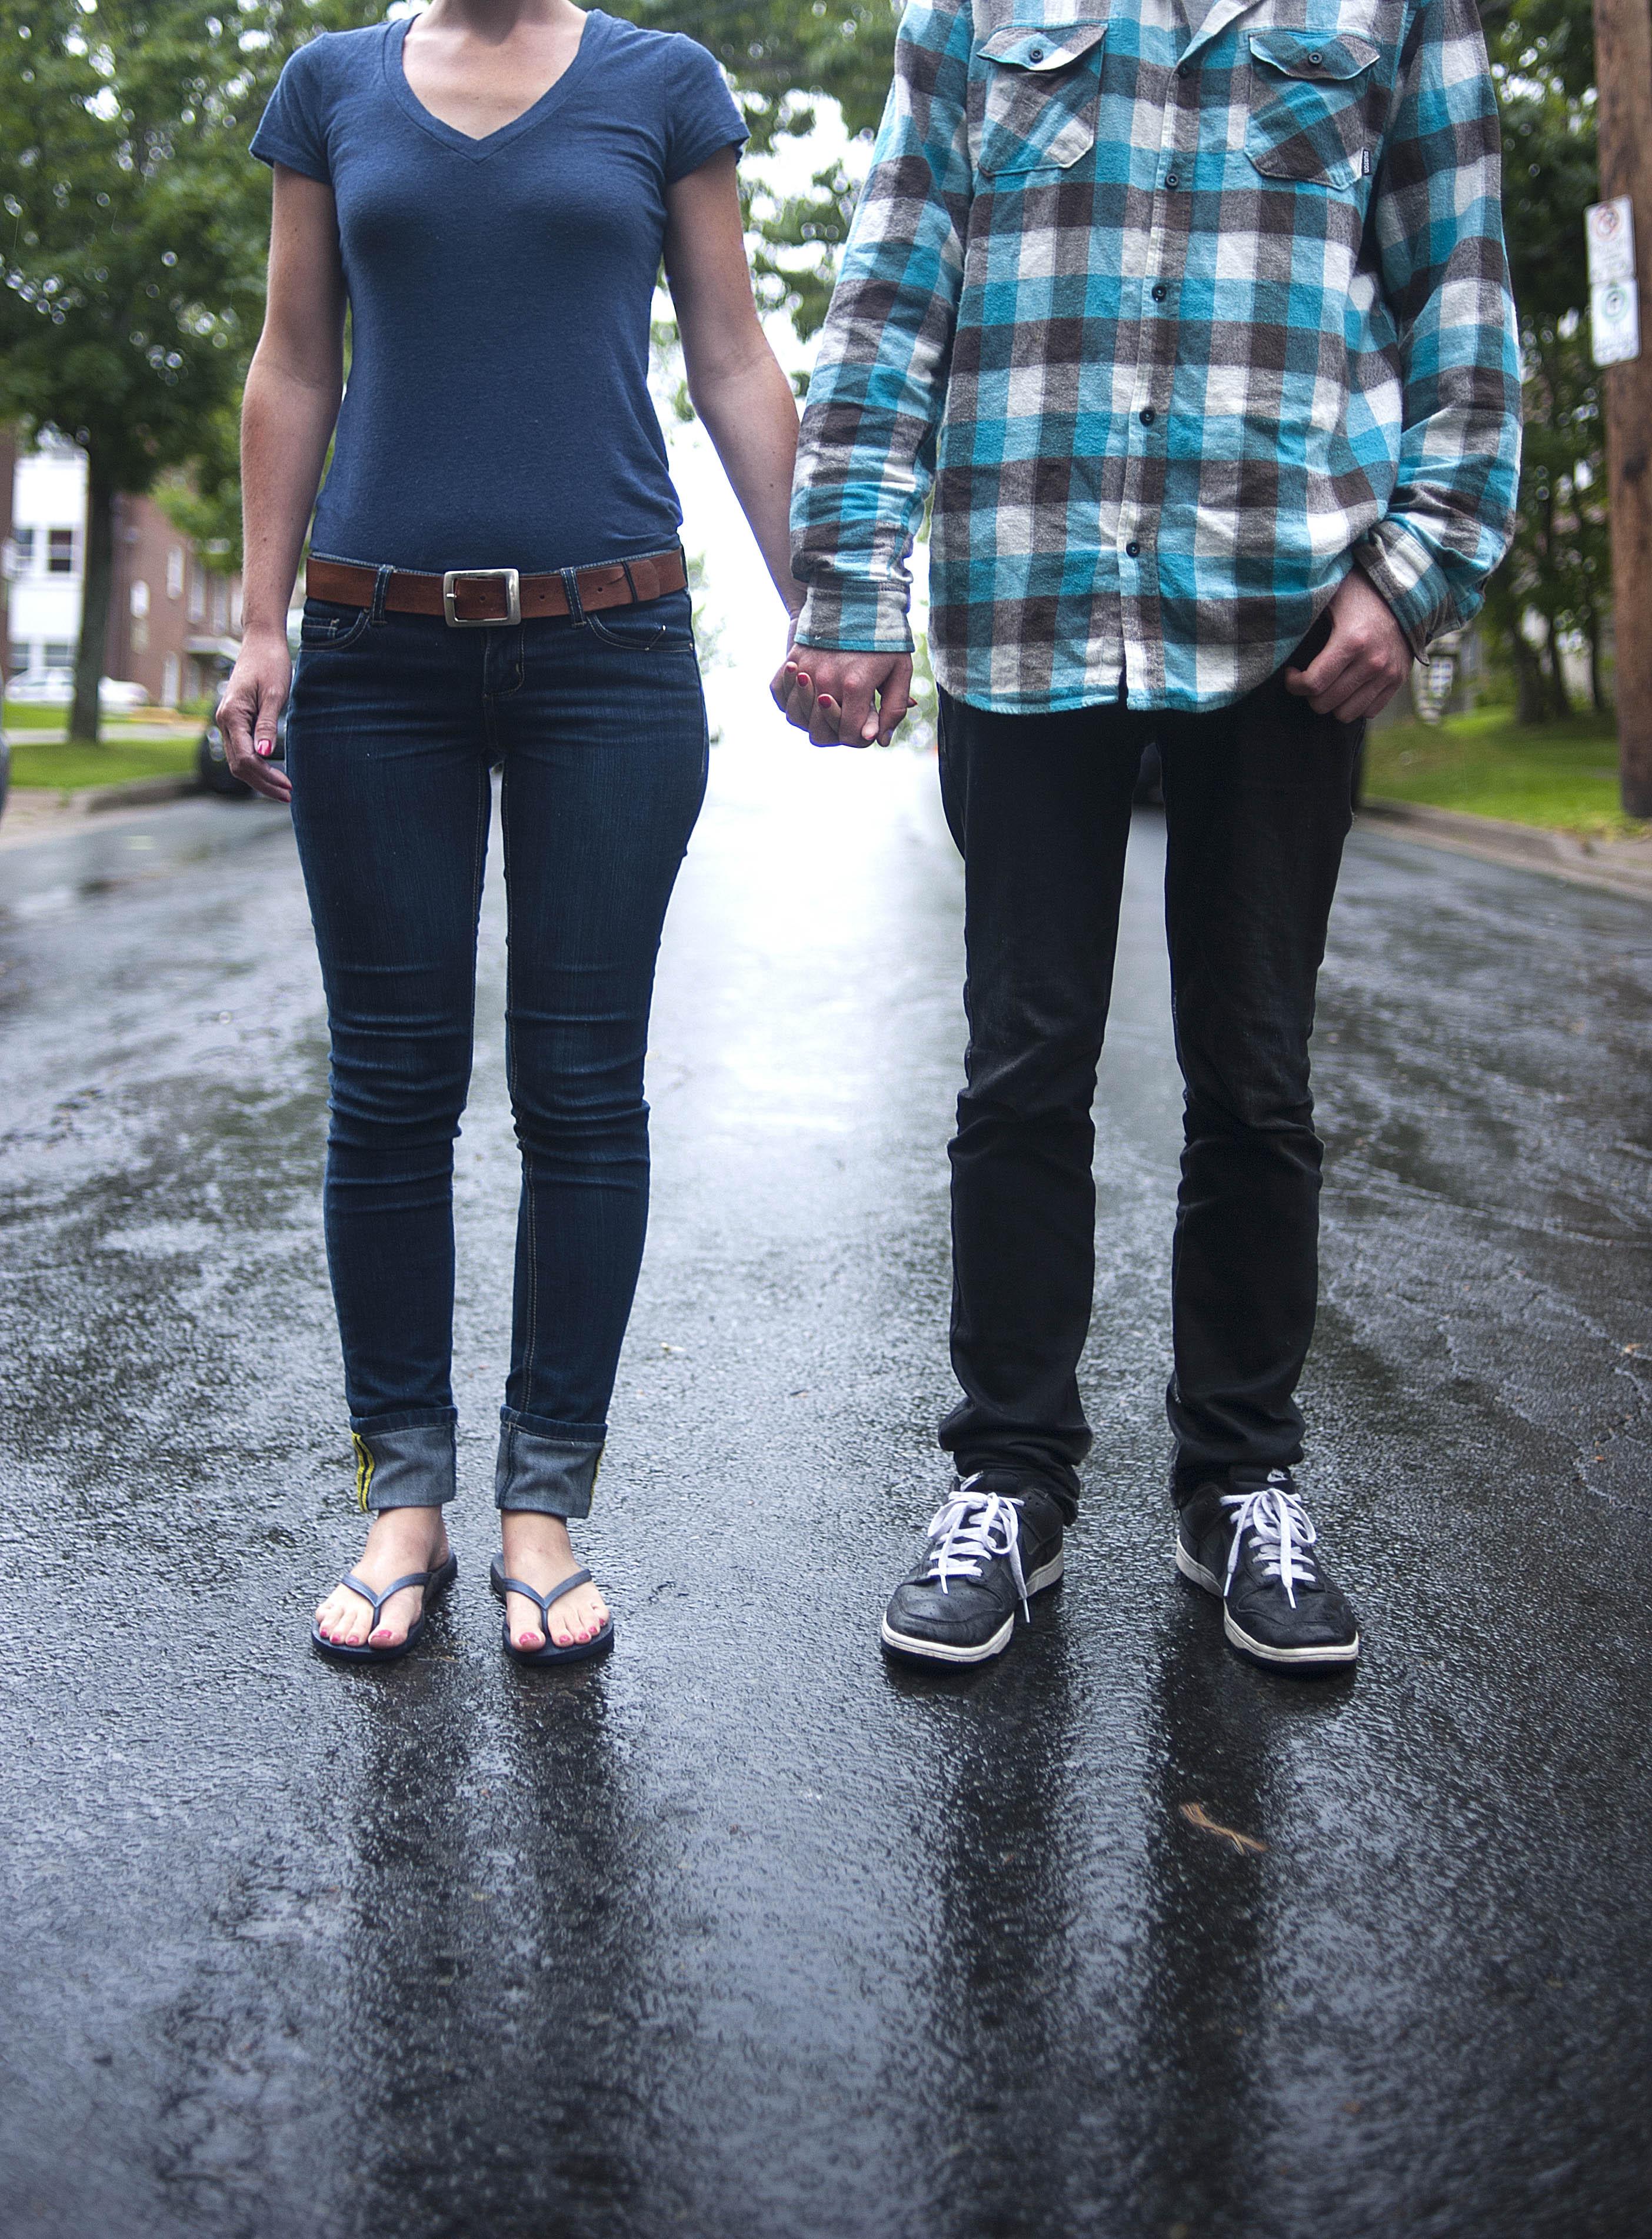 Campus dating - by Angela Gzowski